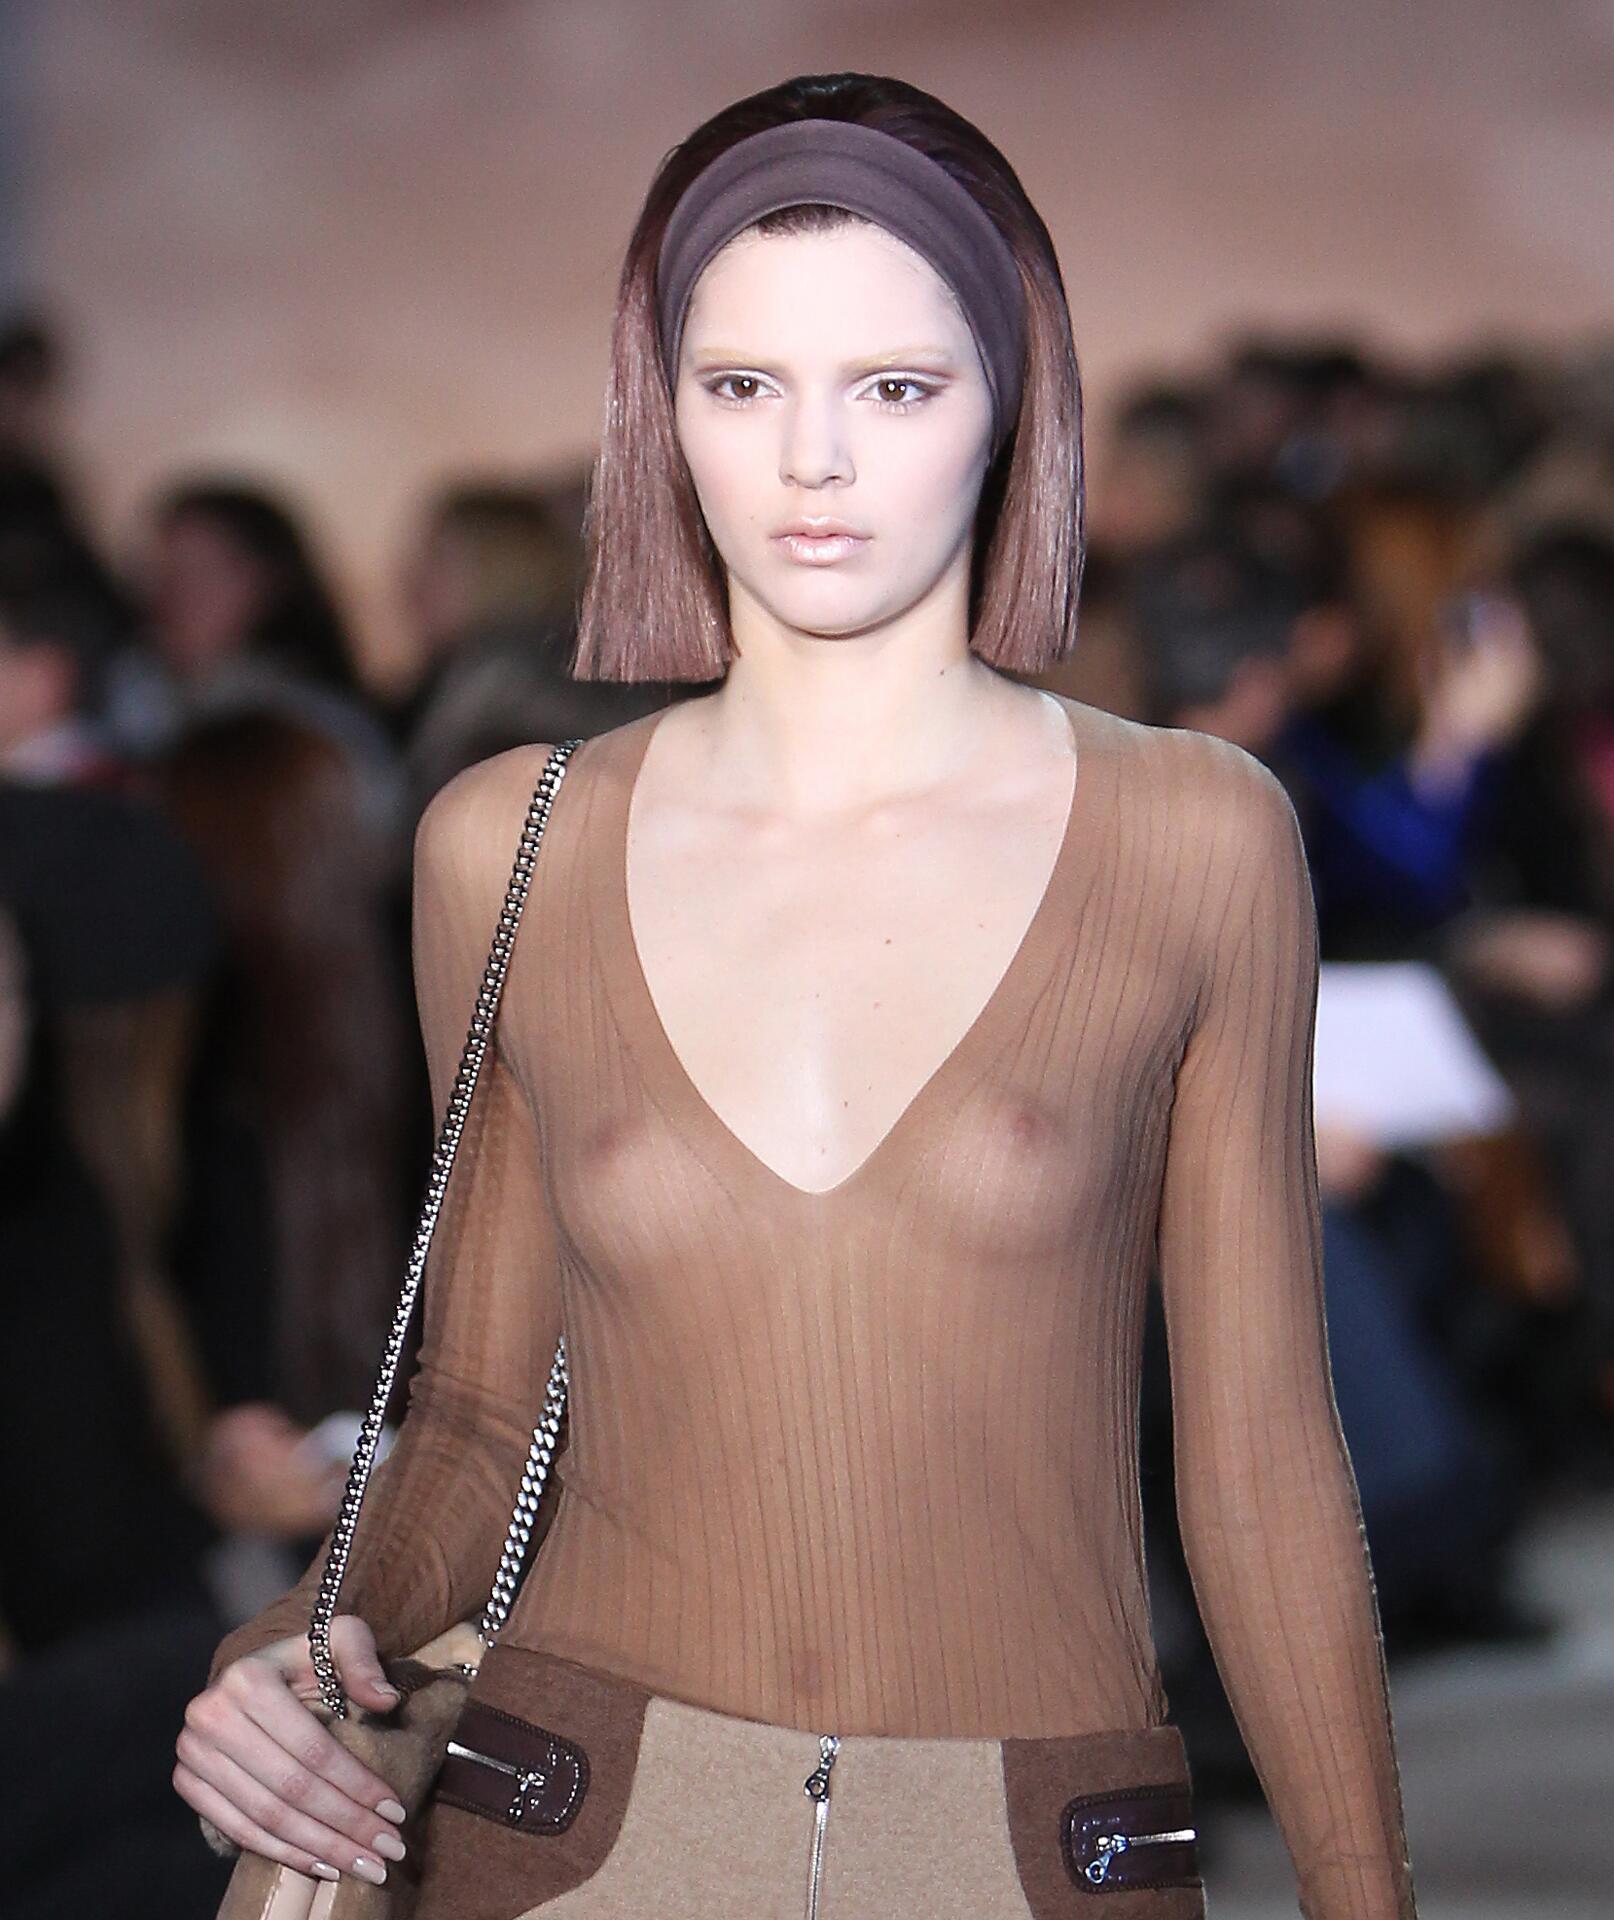 Bild zu Kendall Jenner, sexy, transparent, Nippel, Marc Jacobs